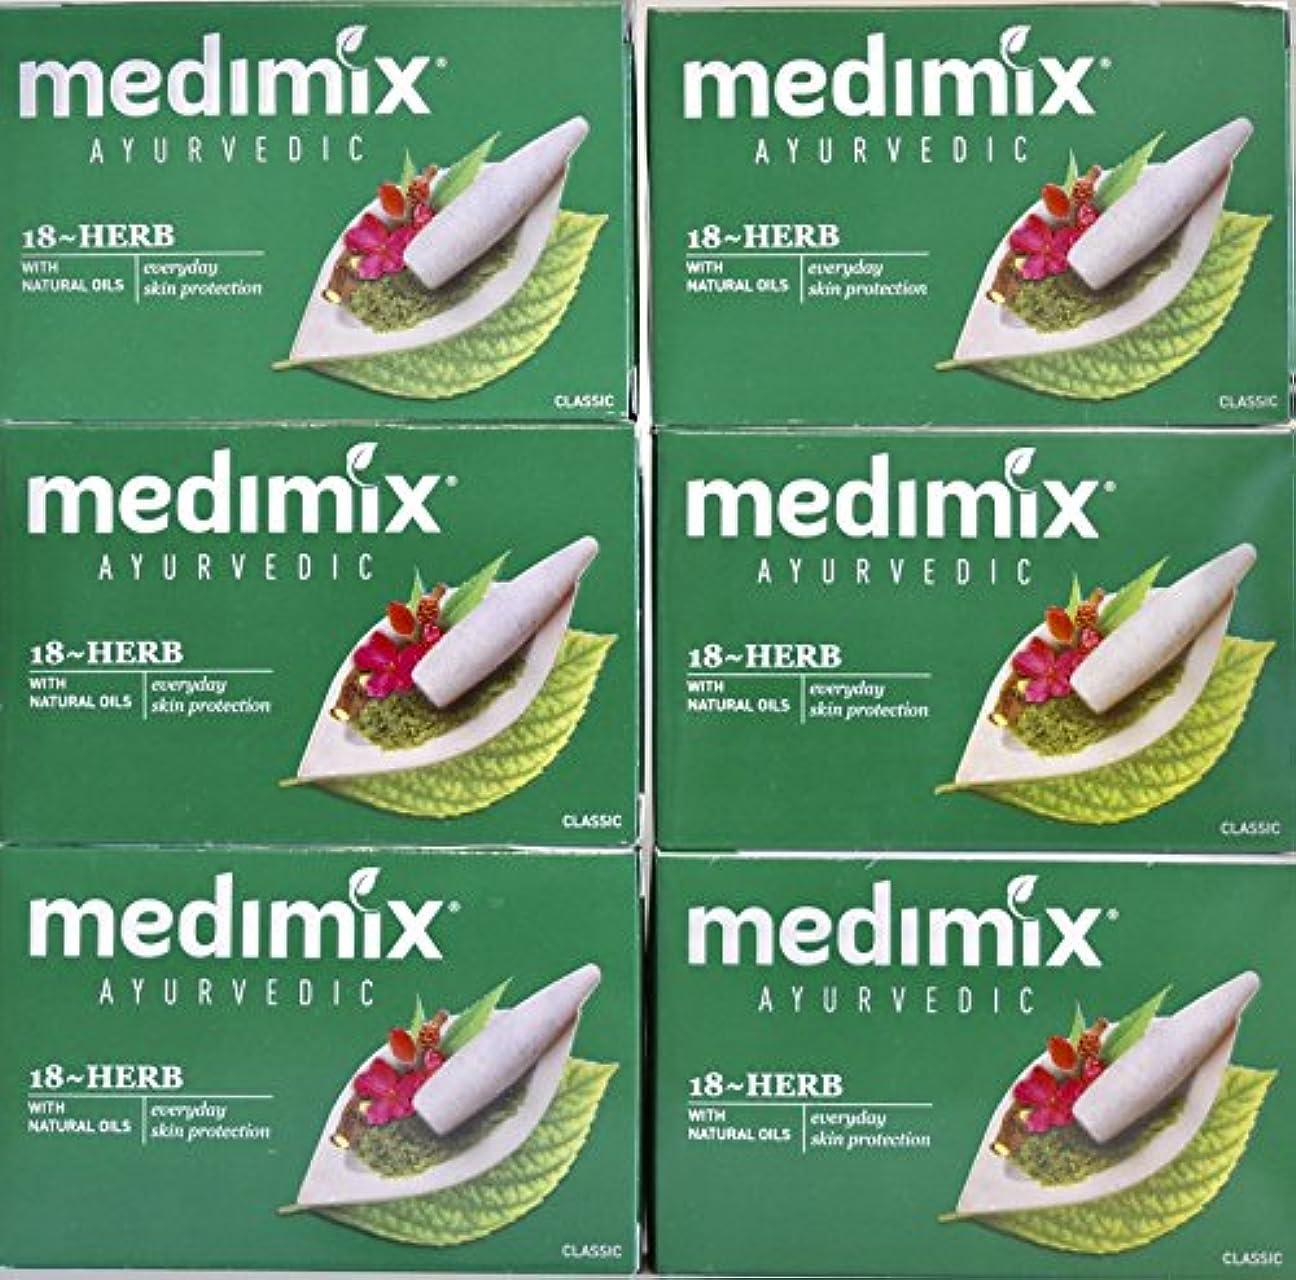 MEDIMIX メディミックス アーユルヴェーダ石鹸 18ハーブス6個セット